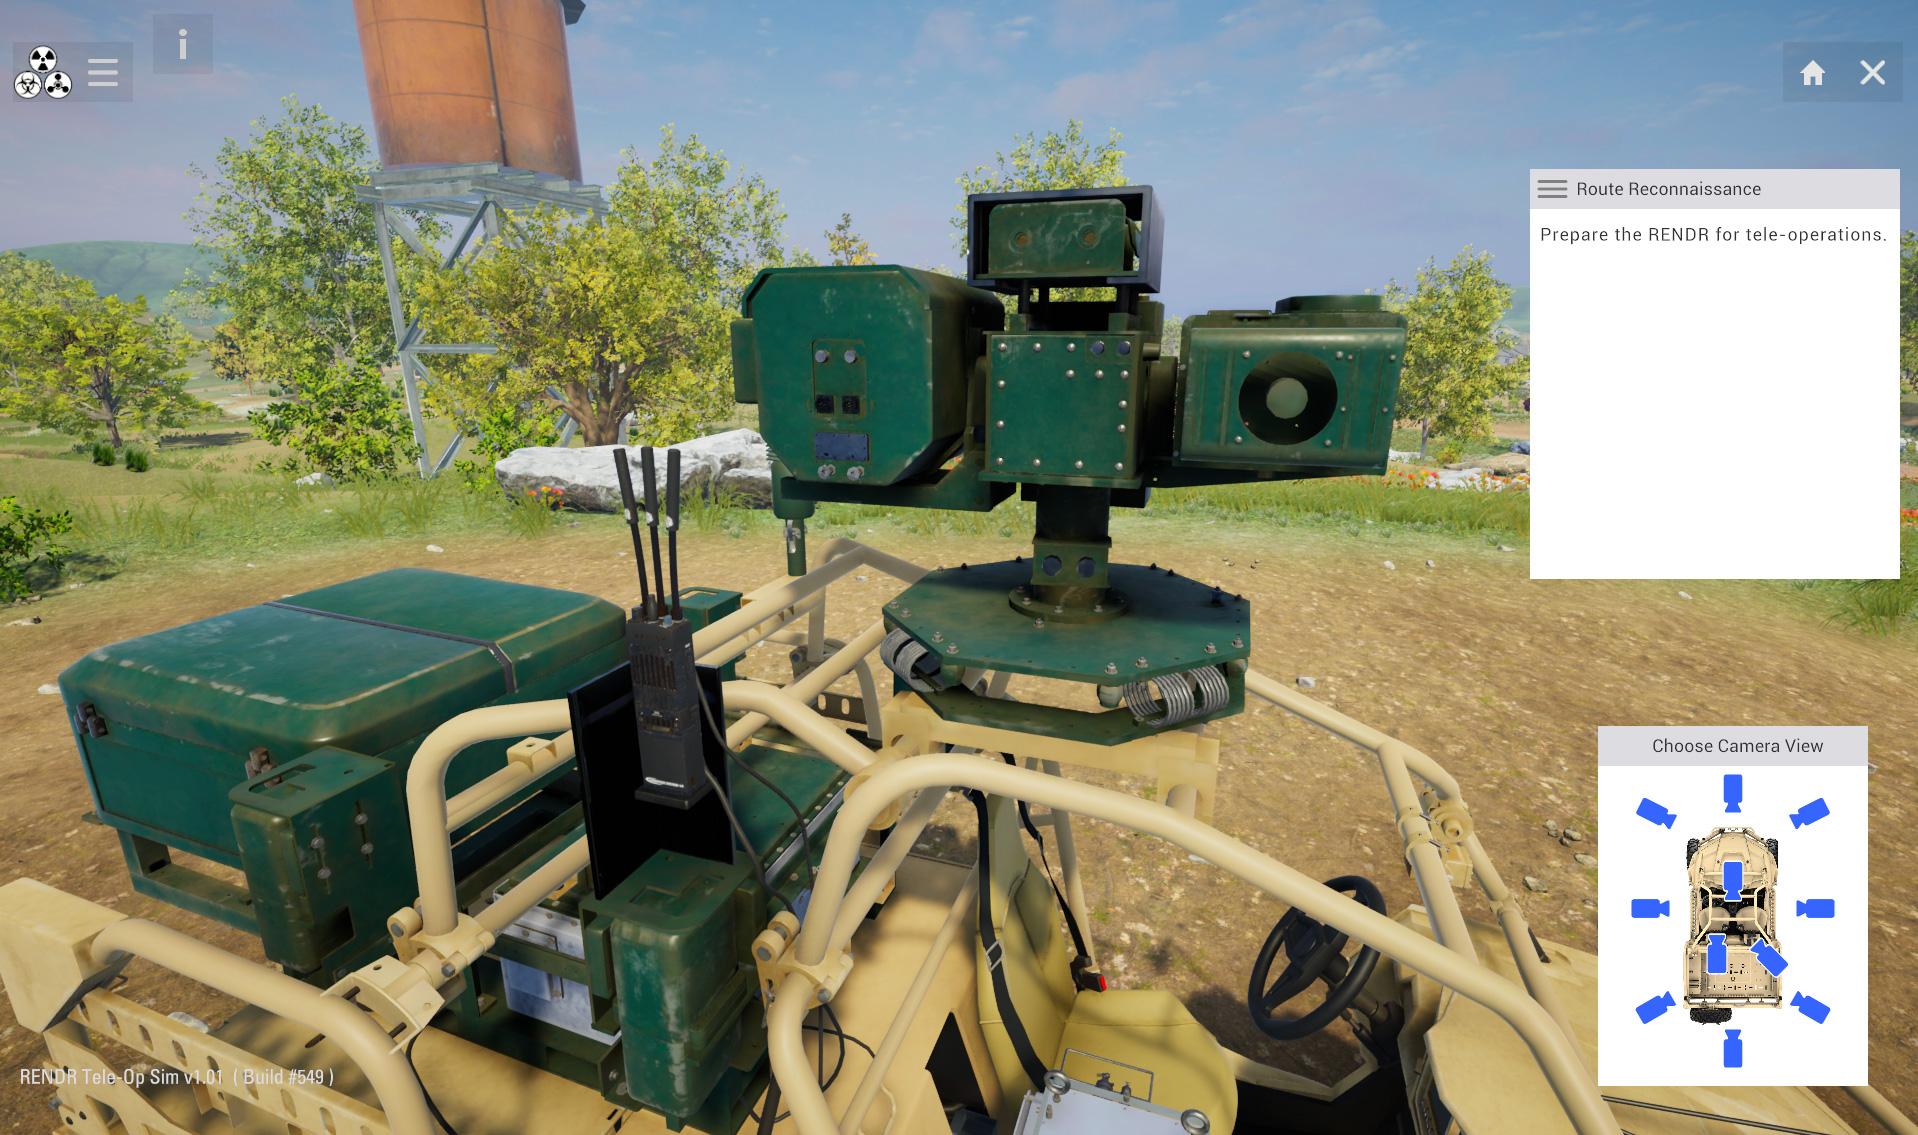 Unmanned Ground Vehicle Operation Training Simulator